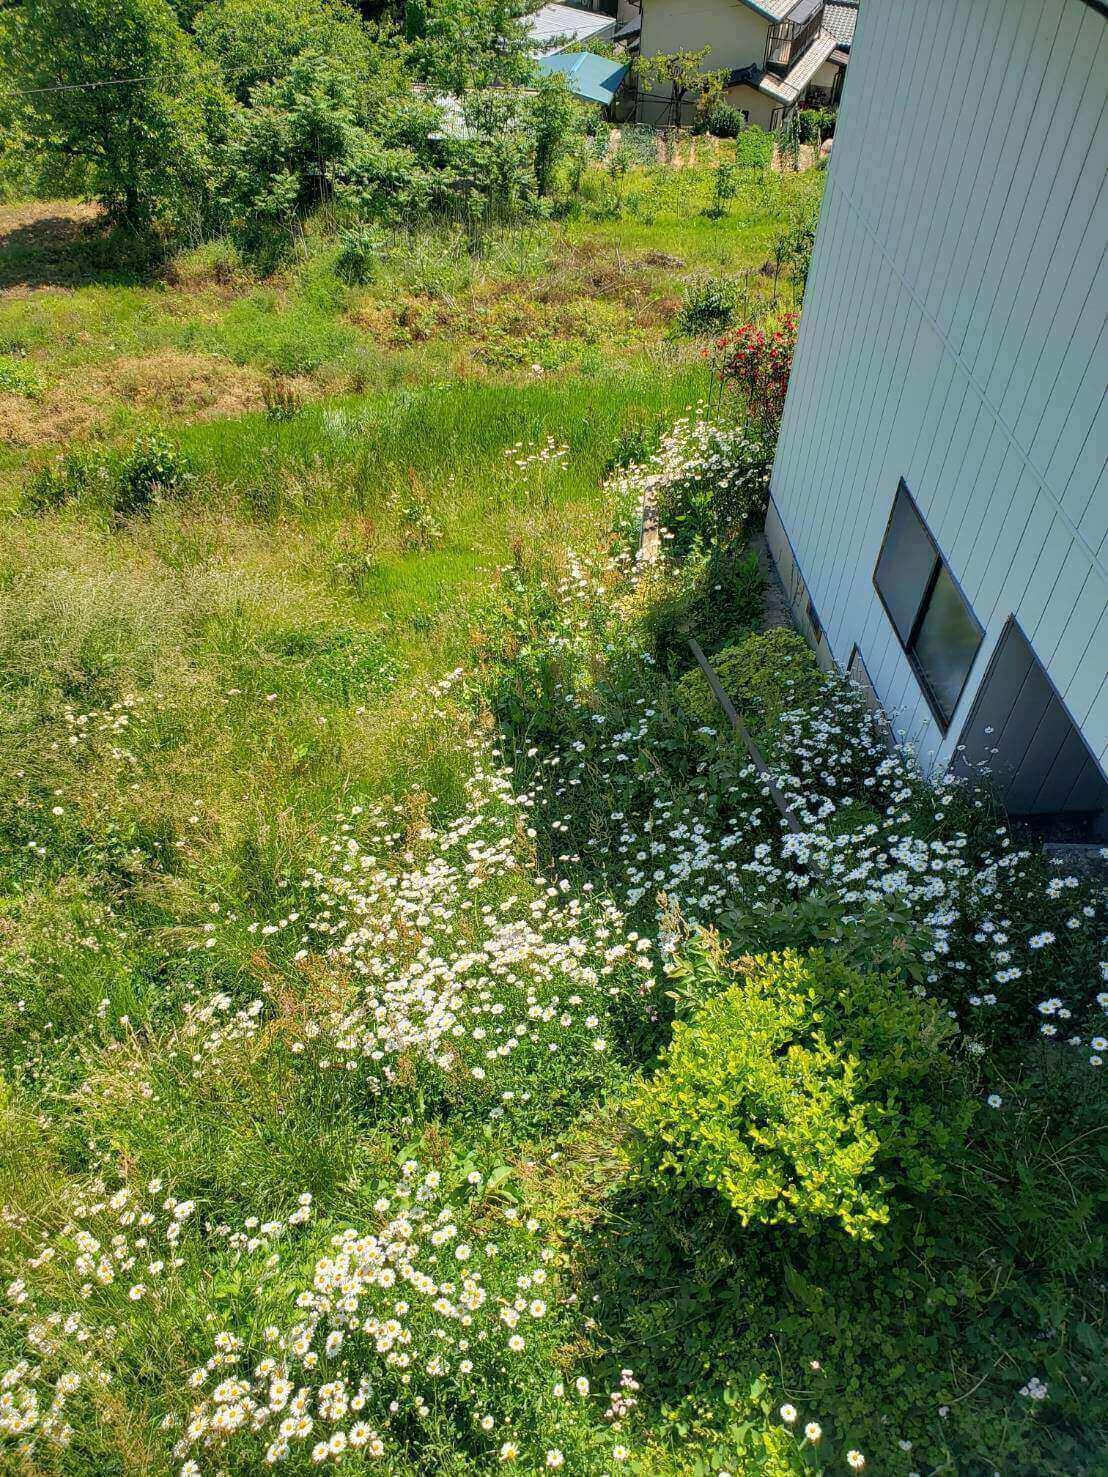 2021年5月31日東信地域草刈り1